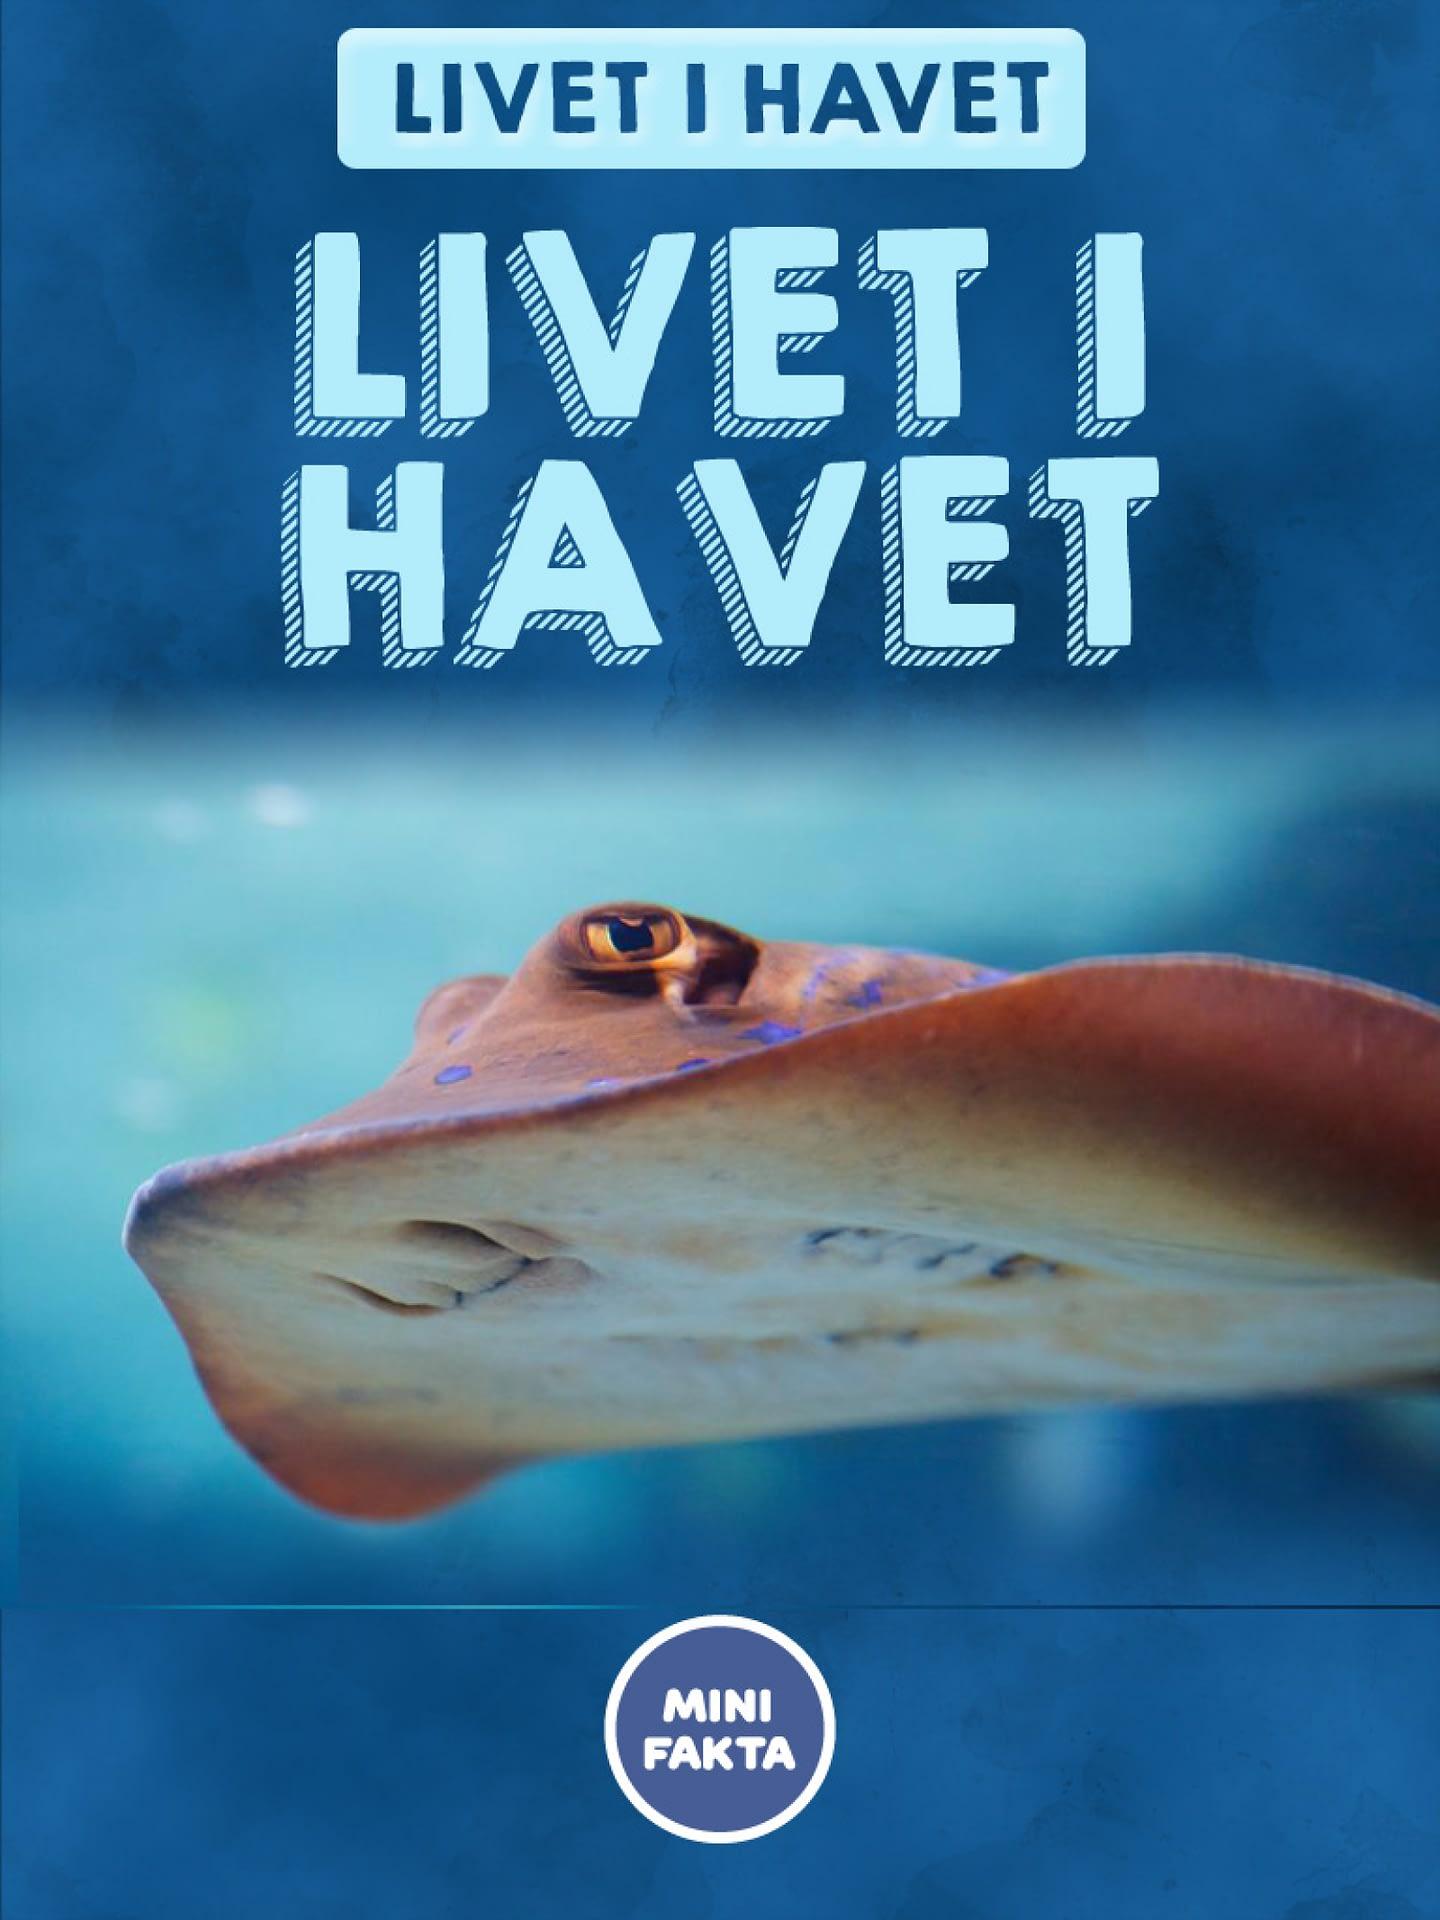 Livet i havet Minifakta